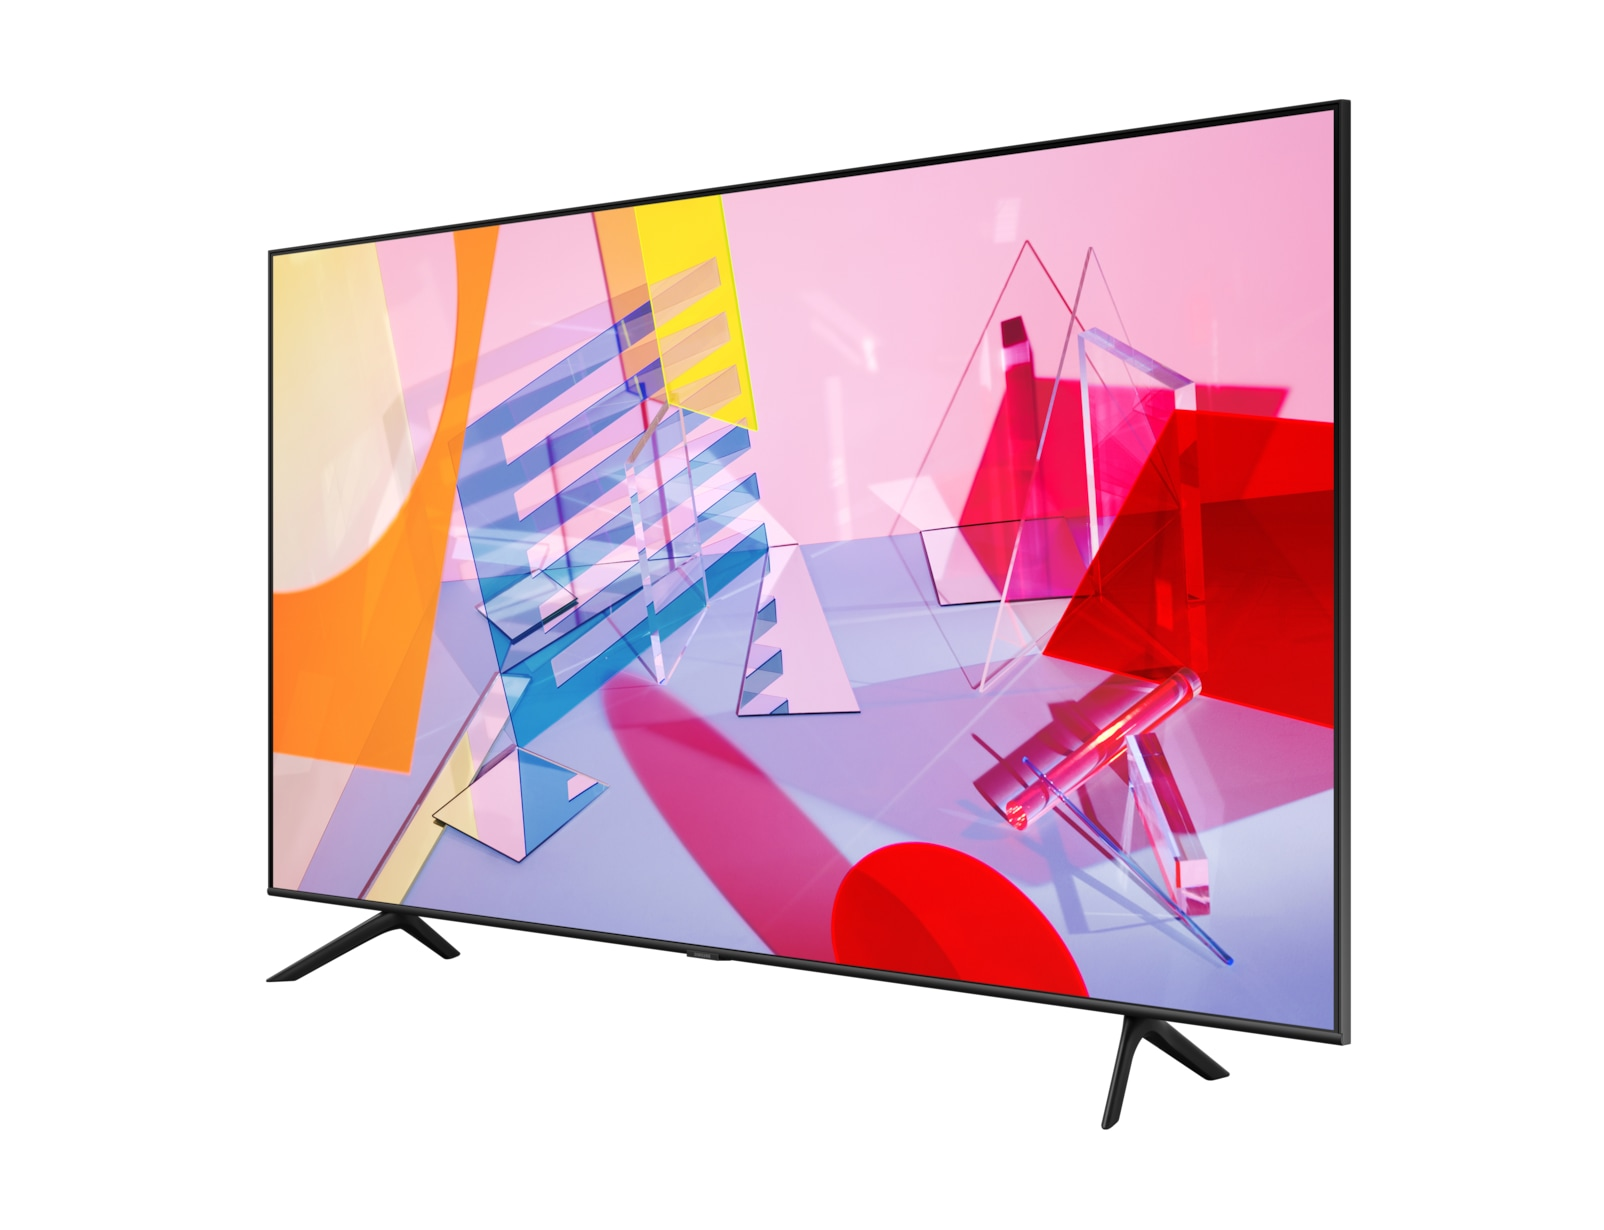 QLED TV 65 Samsung 65Q60TAU Smart TV, 4K